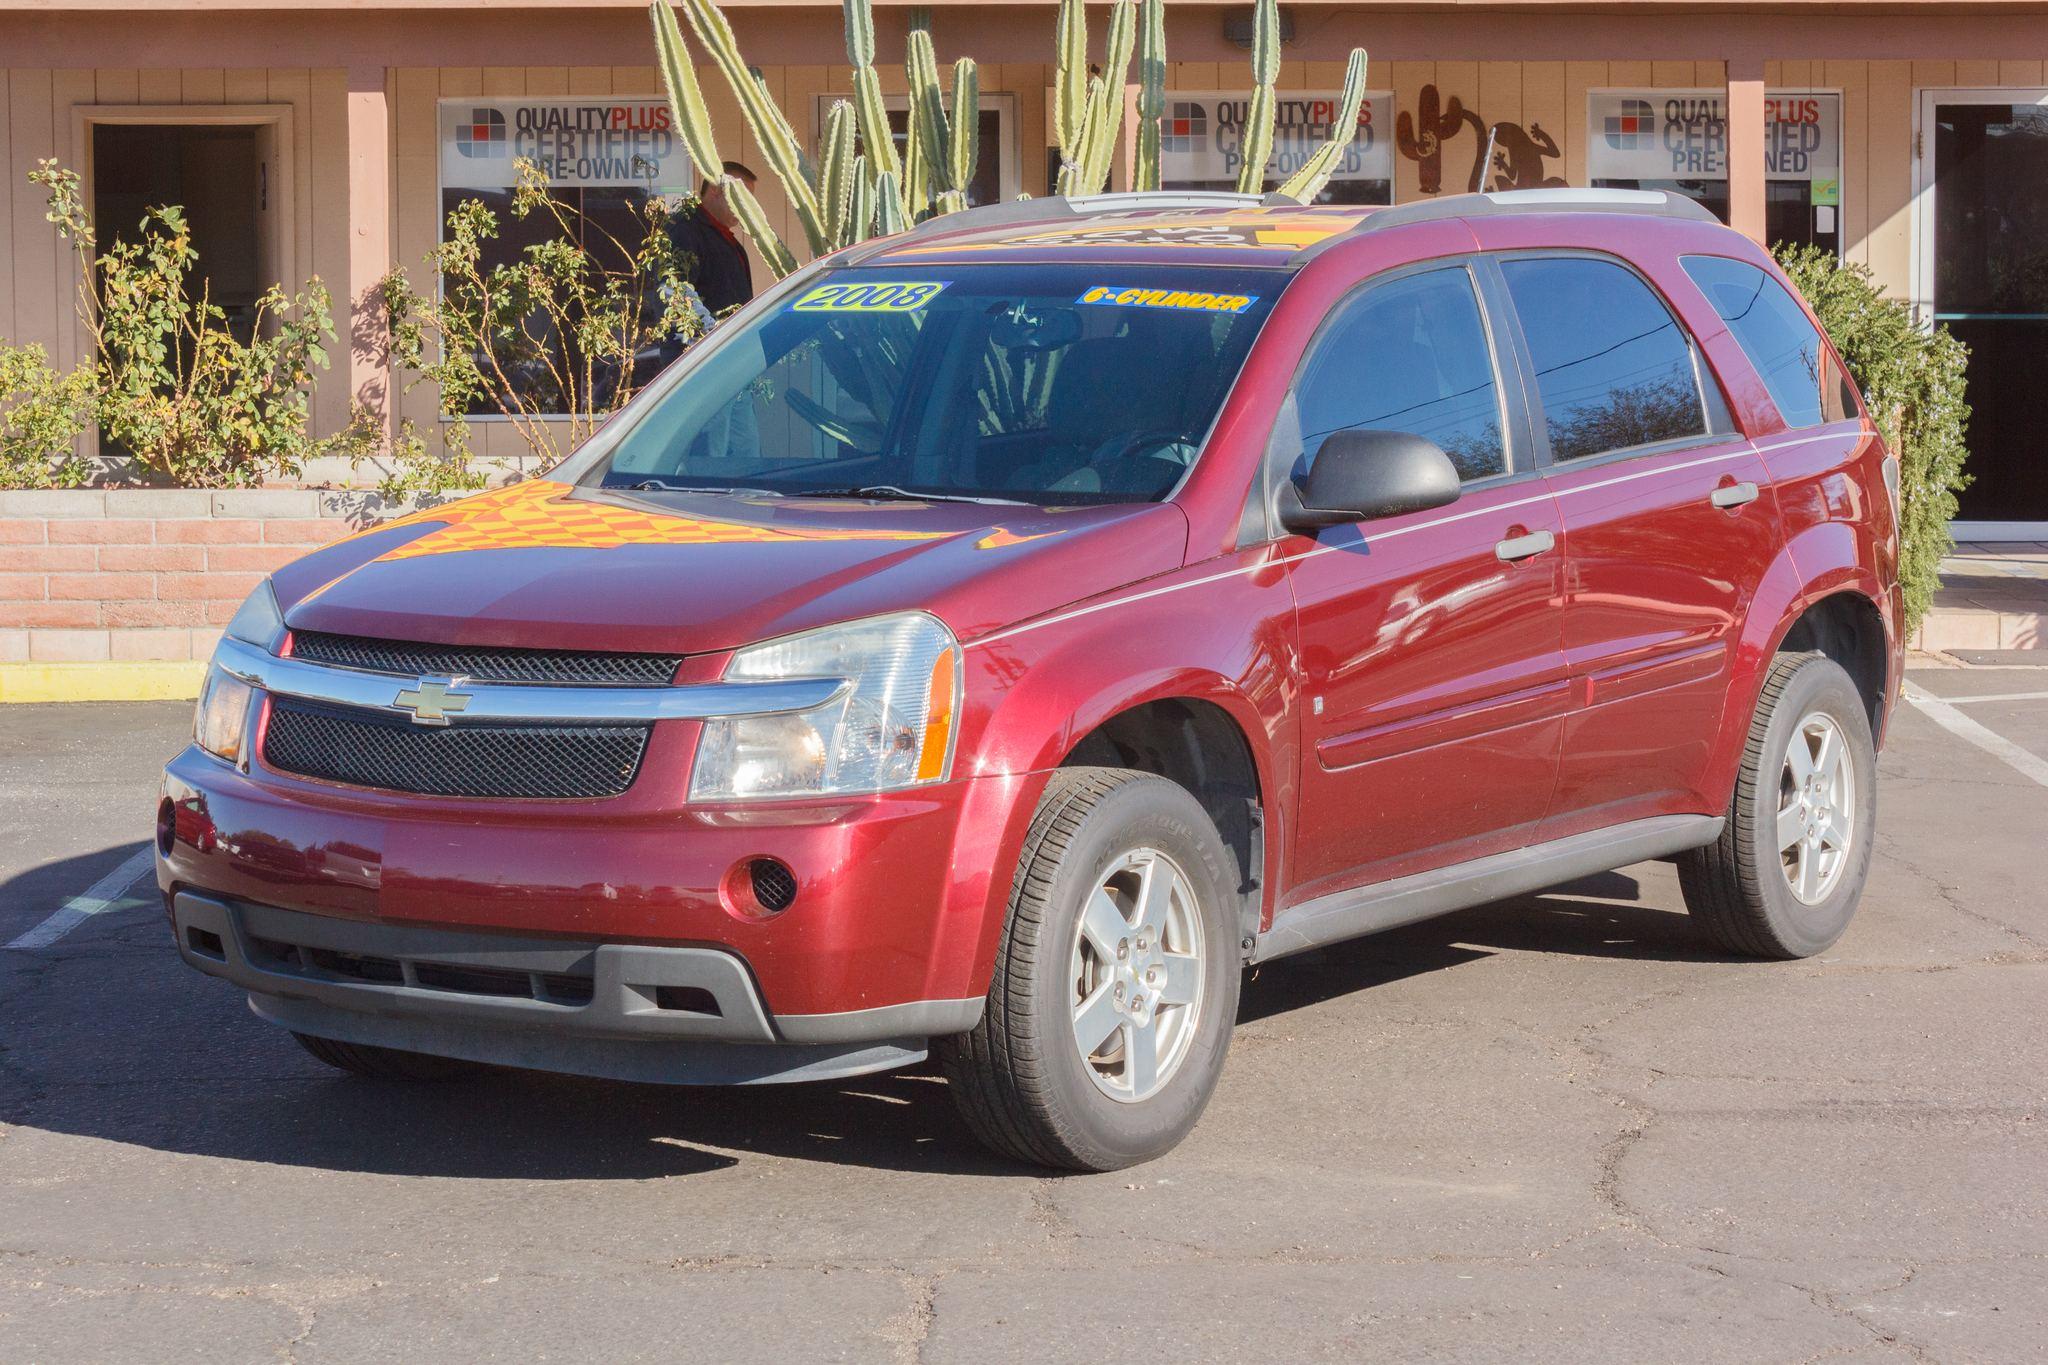 Photo of 2008 Chevrolet Equinox FWD 4d Wagon LS Deep Ruby Metallic